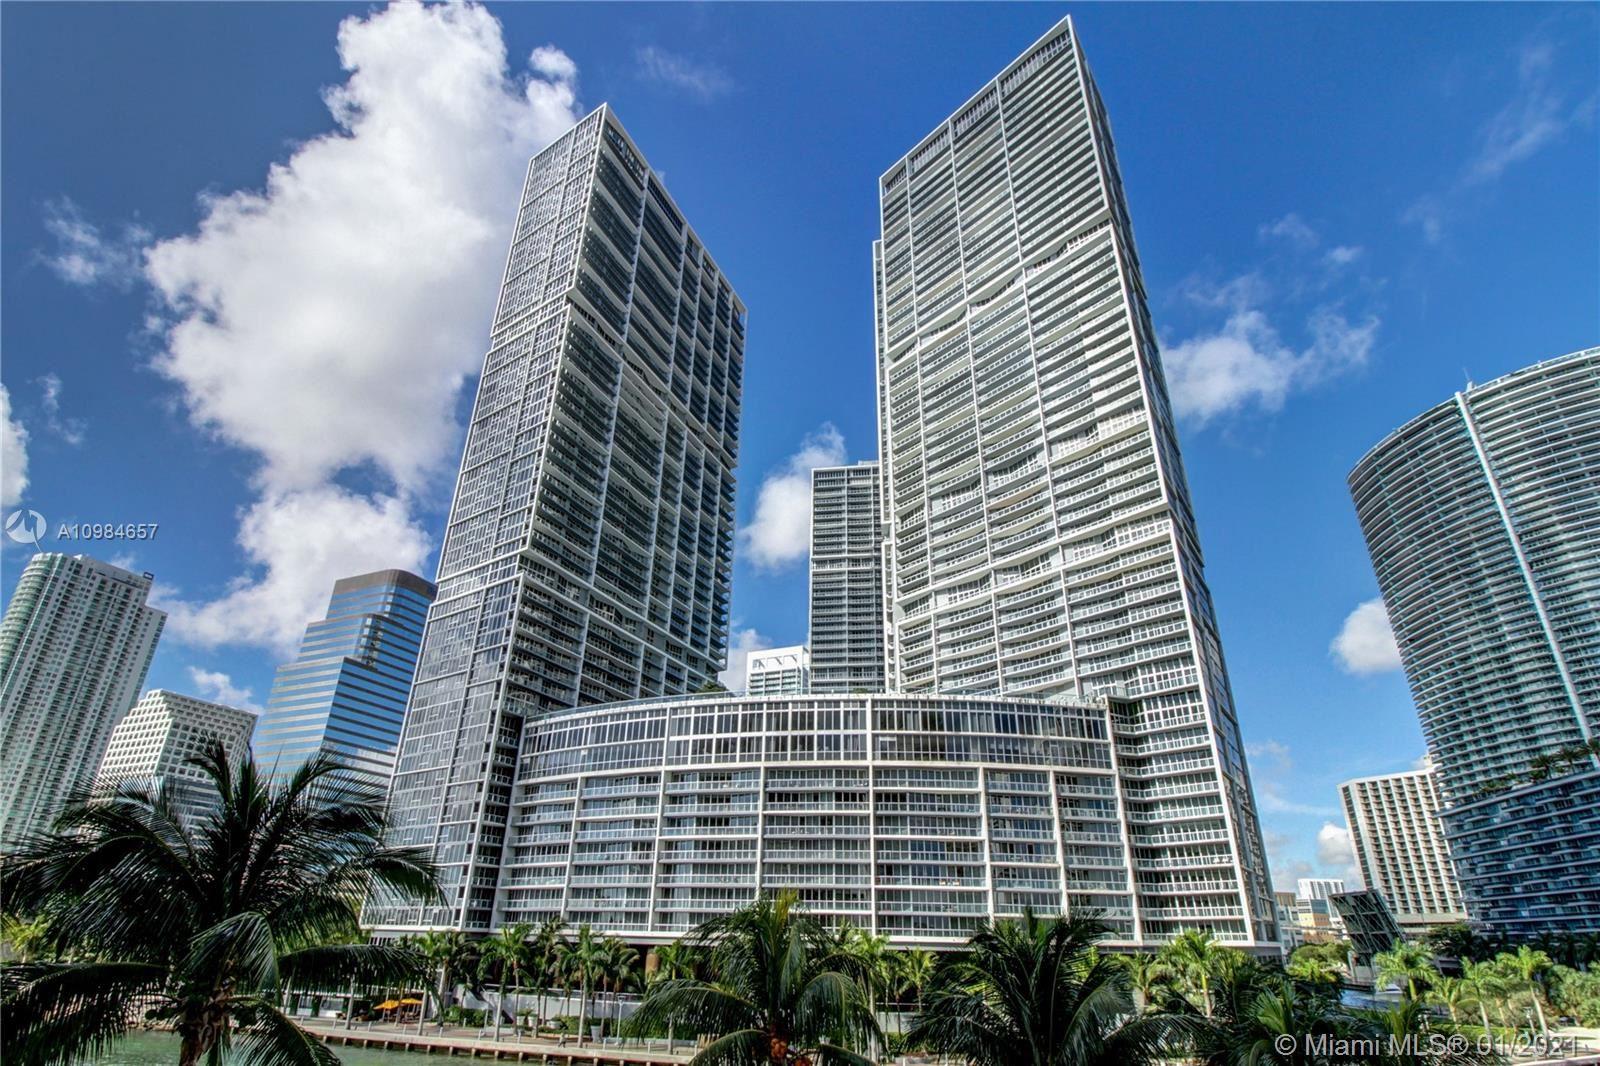 Photo of 475 Brickell Ave #4515, Miami, FL 33131 (MLS # A10984657)